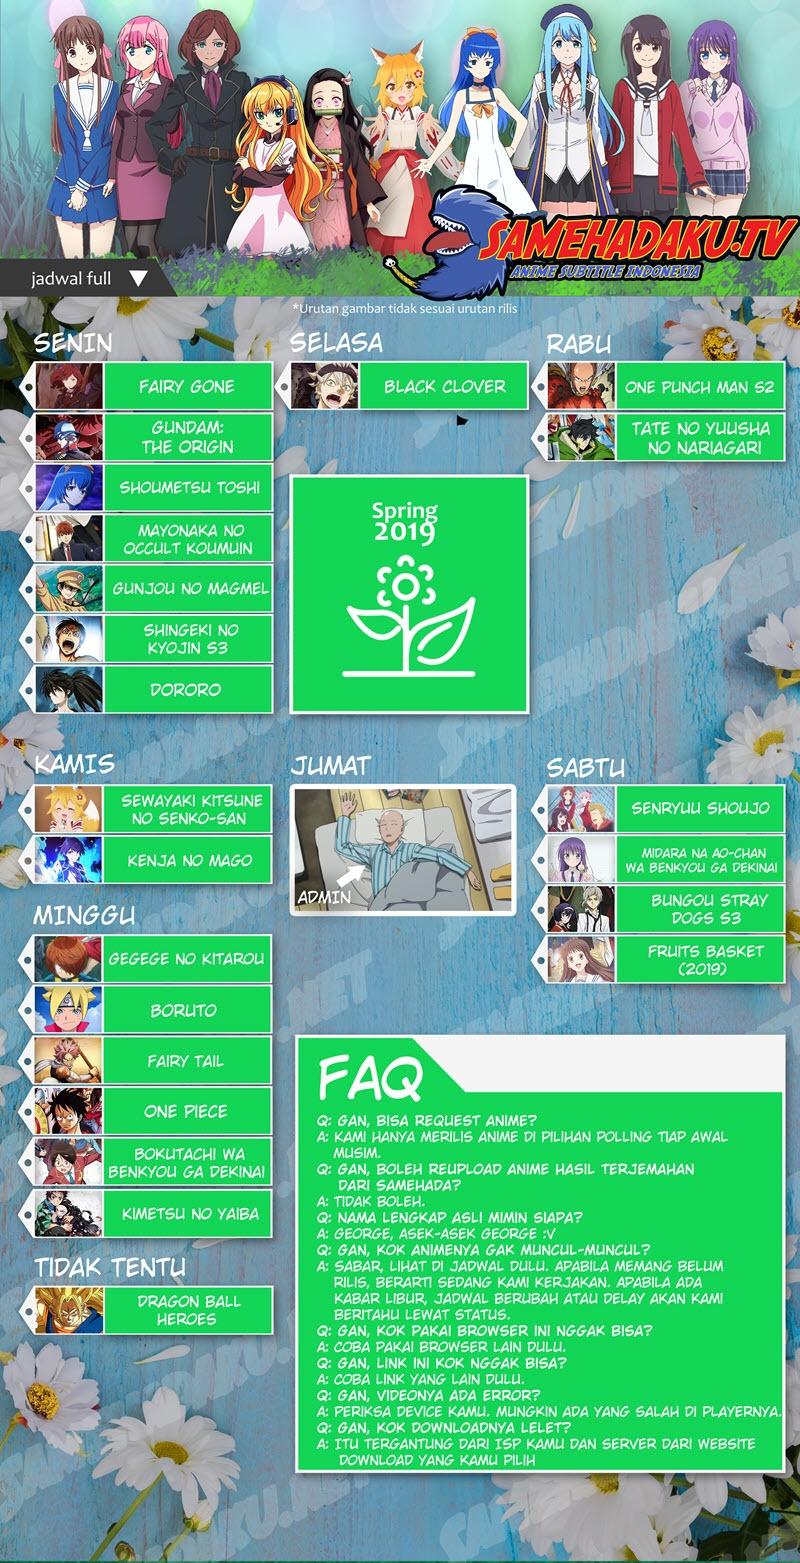 Daftar Anime Subtitle Indonesia